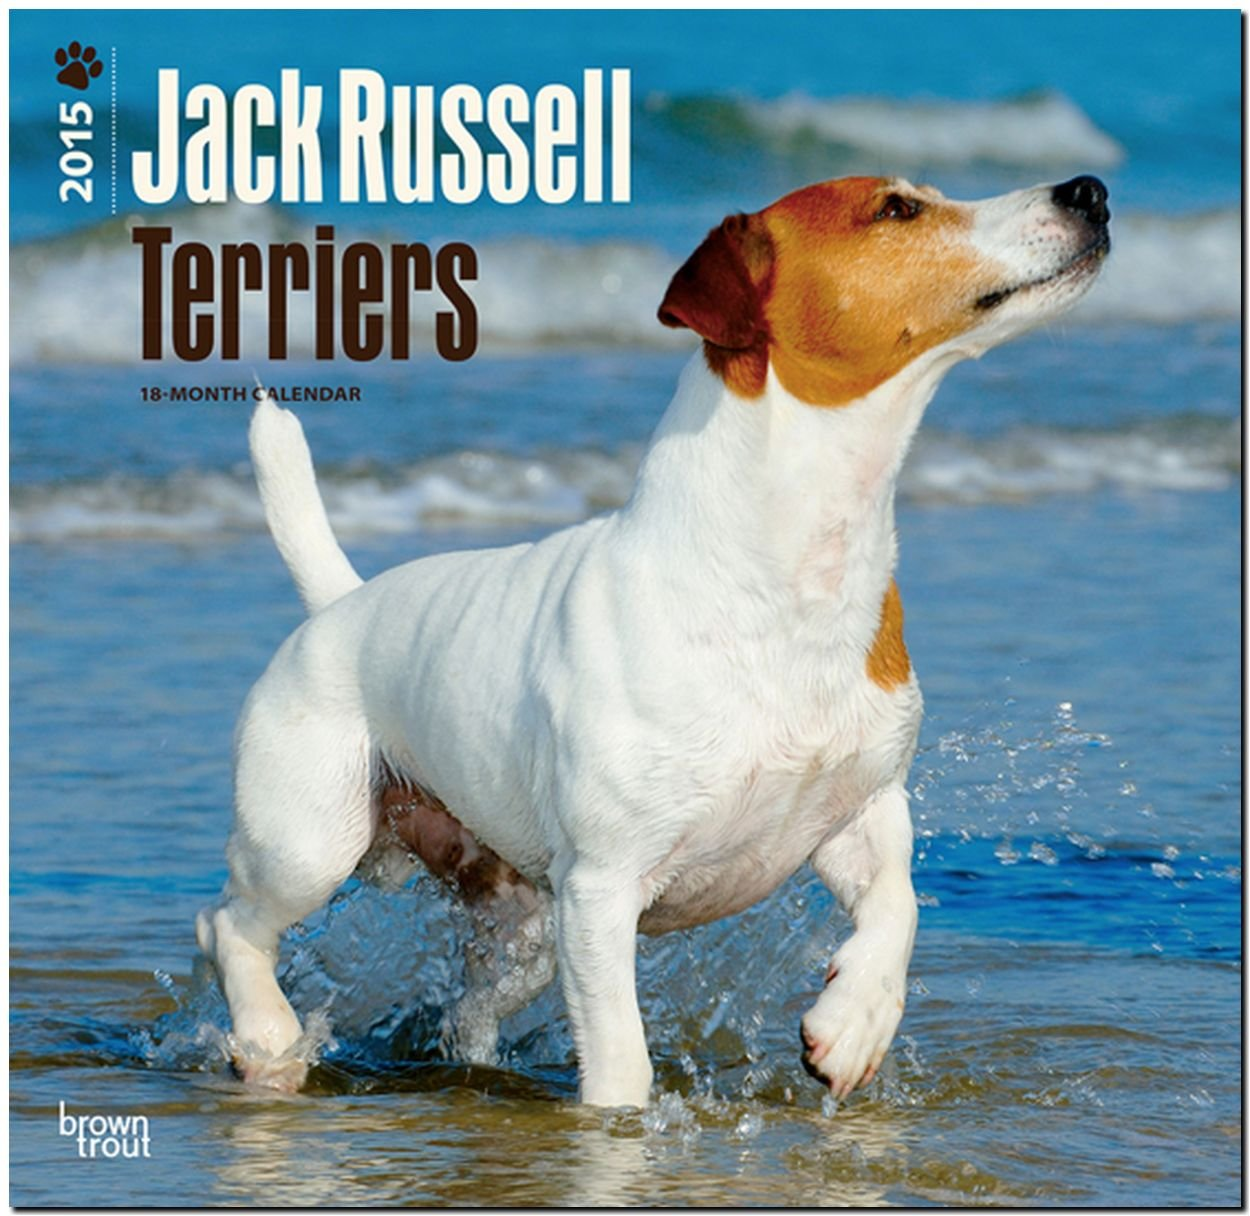 Jack Russell Terriers 2015: Original BrownTrout-Kalender [Mehrsprachig] [Kalender]